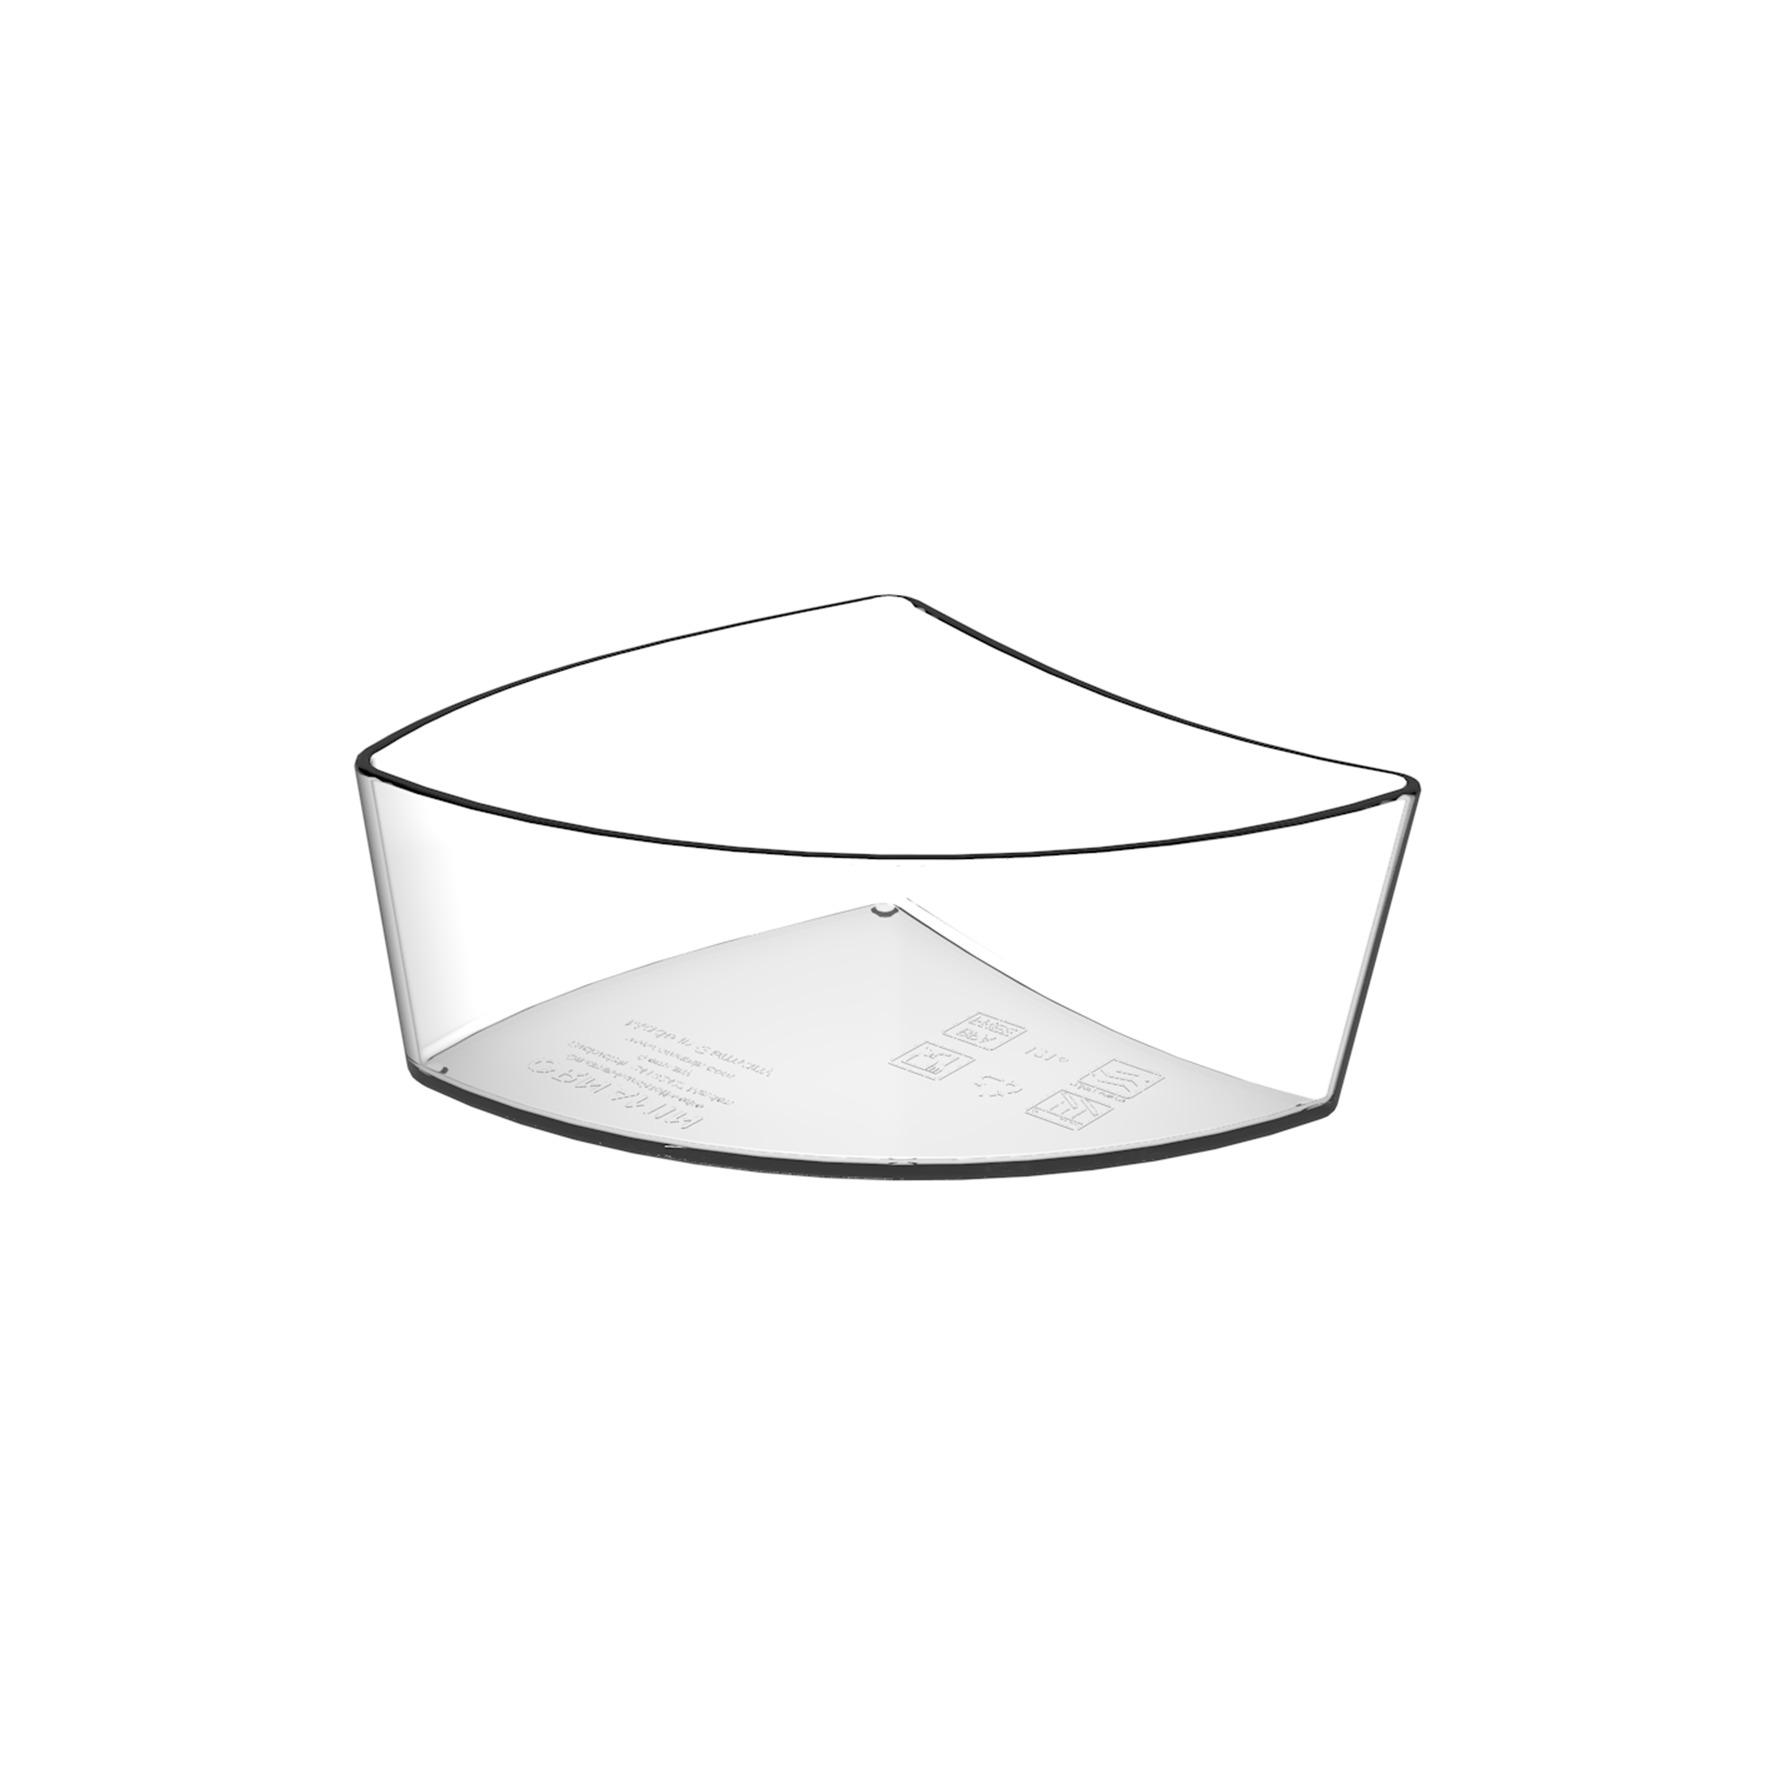 Box insert small set of 4